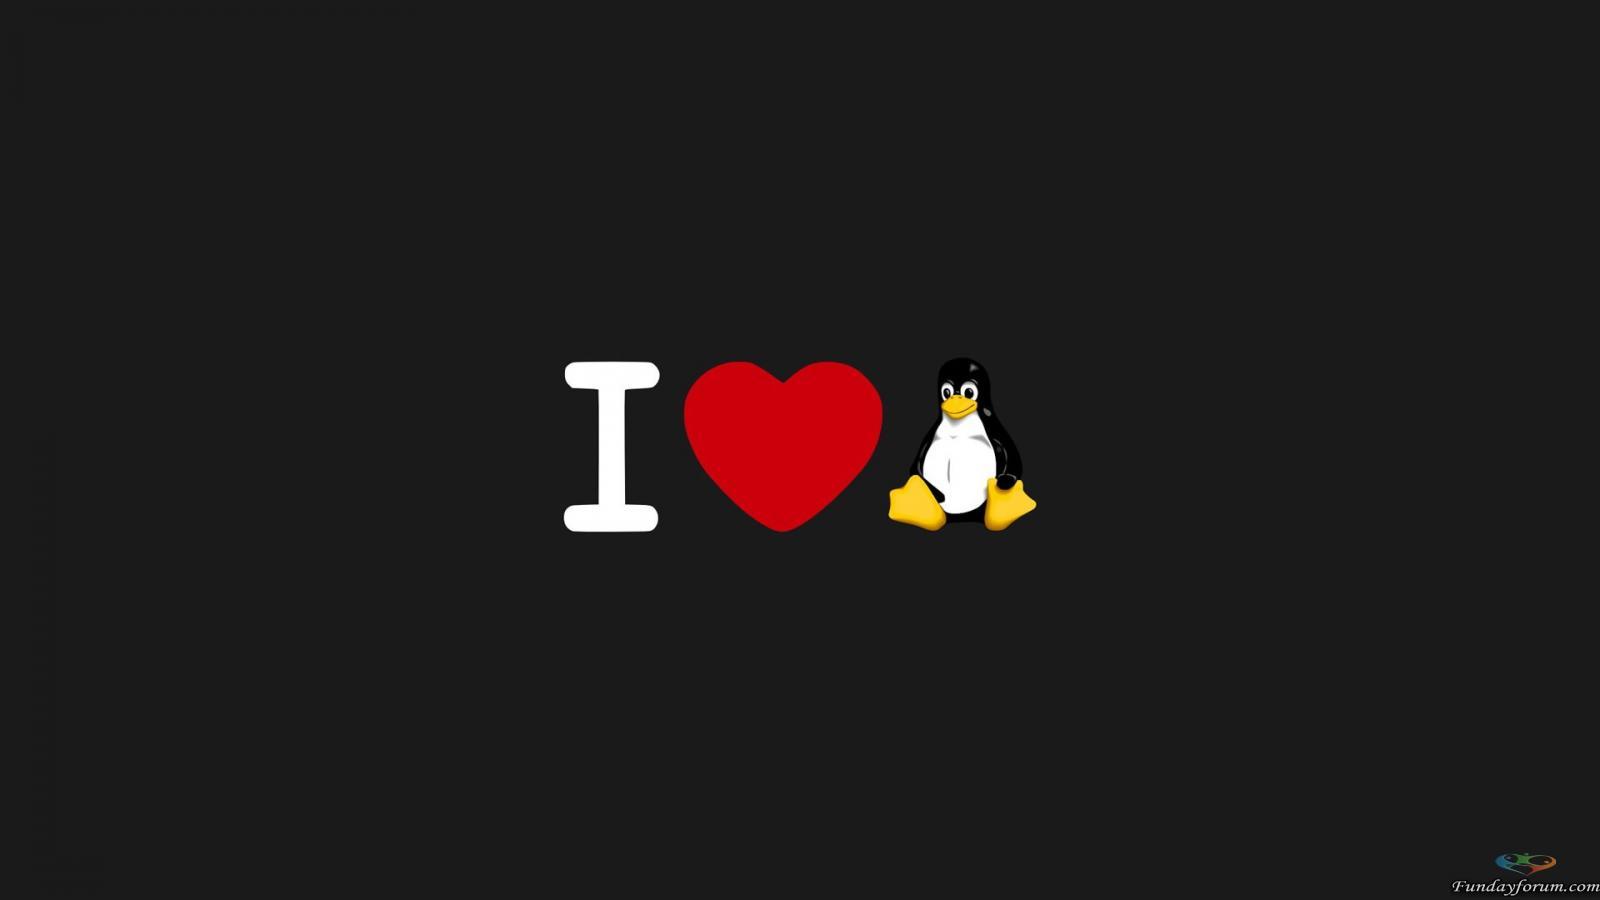 i-love-linux-1920x1080.jpg